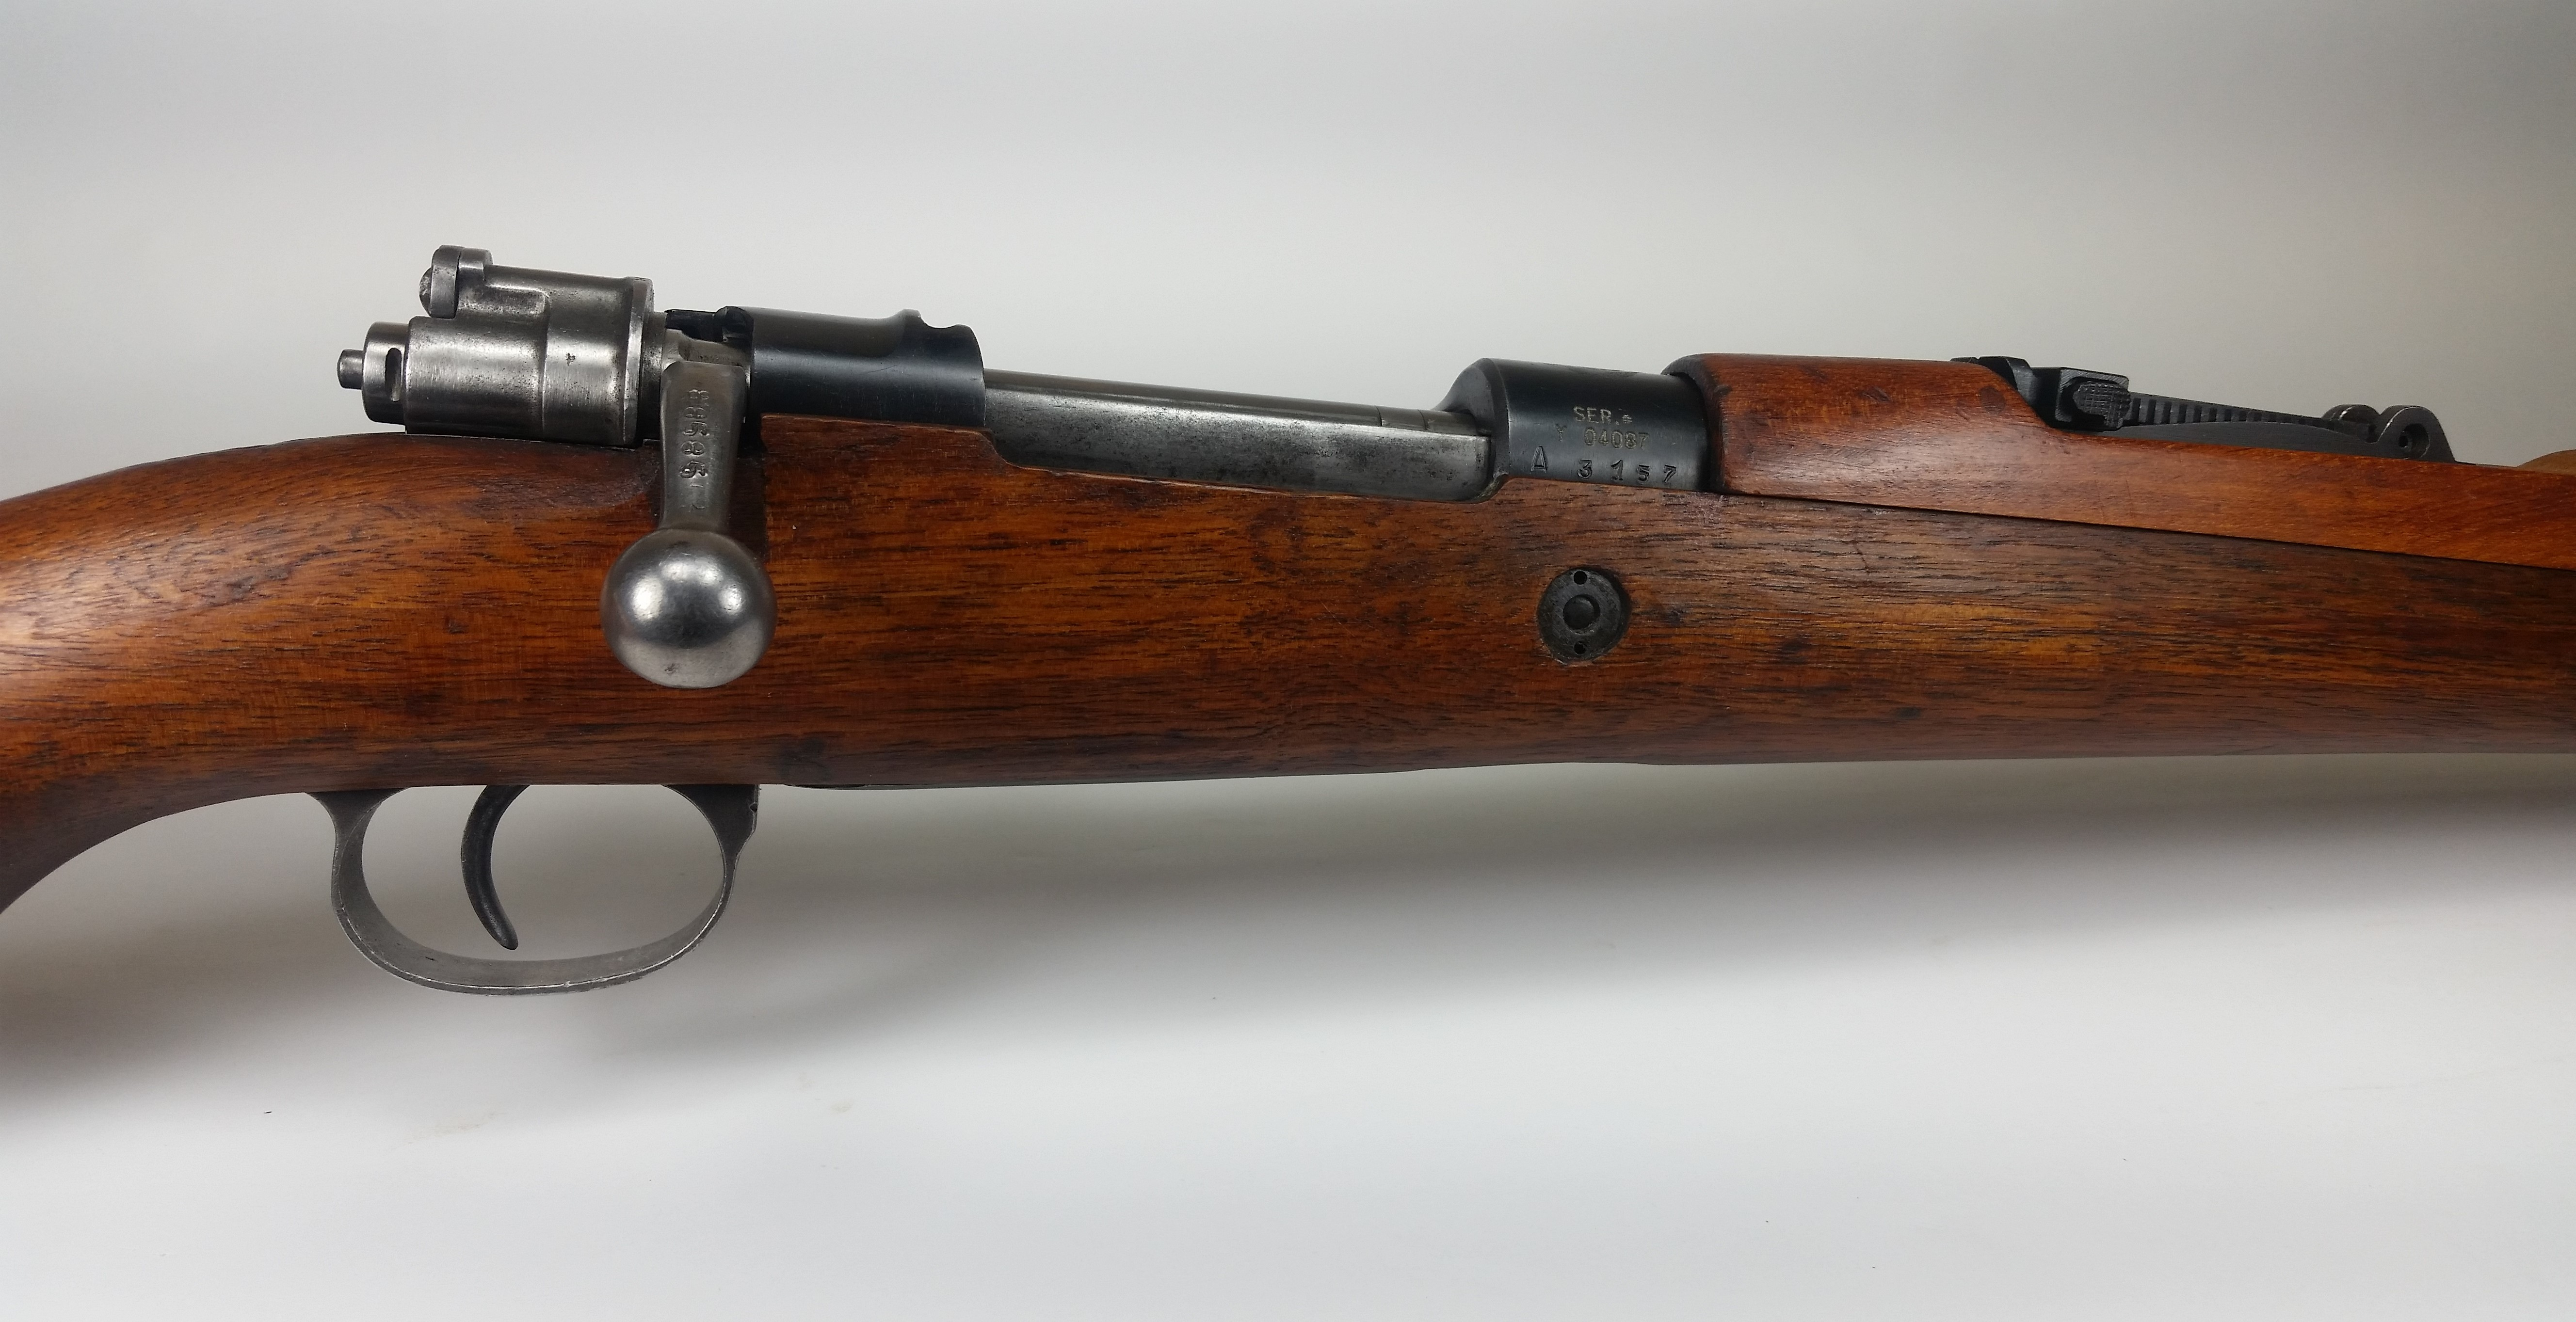 Yugo Mauser Model 24/47 Rifle 8x57mm (Used Firearm)